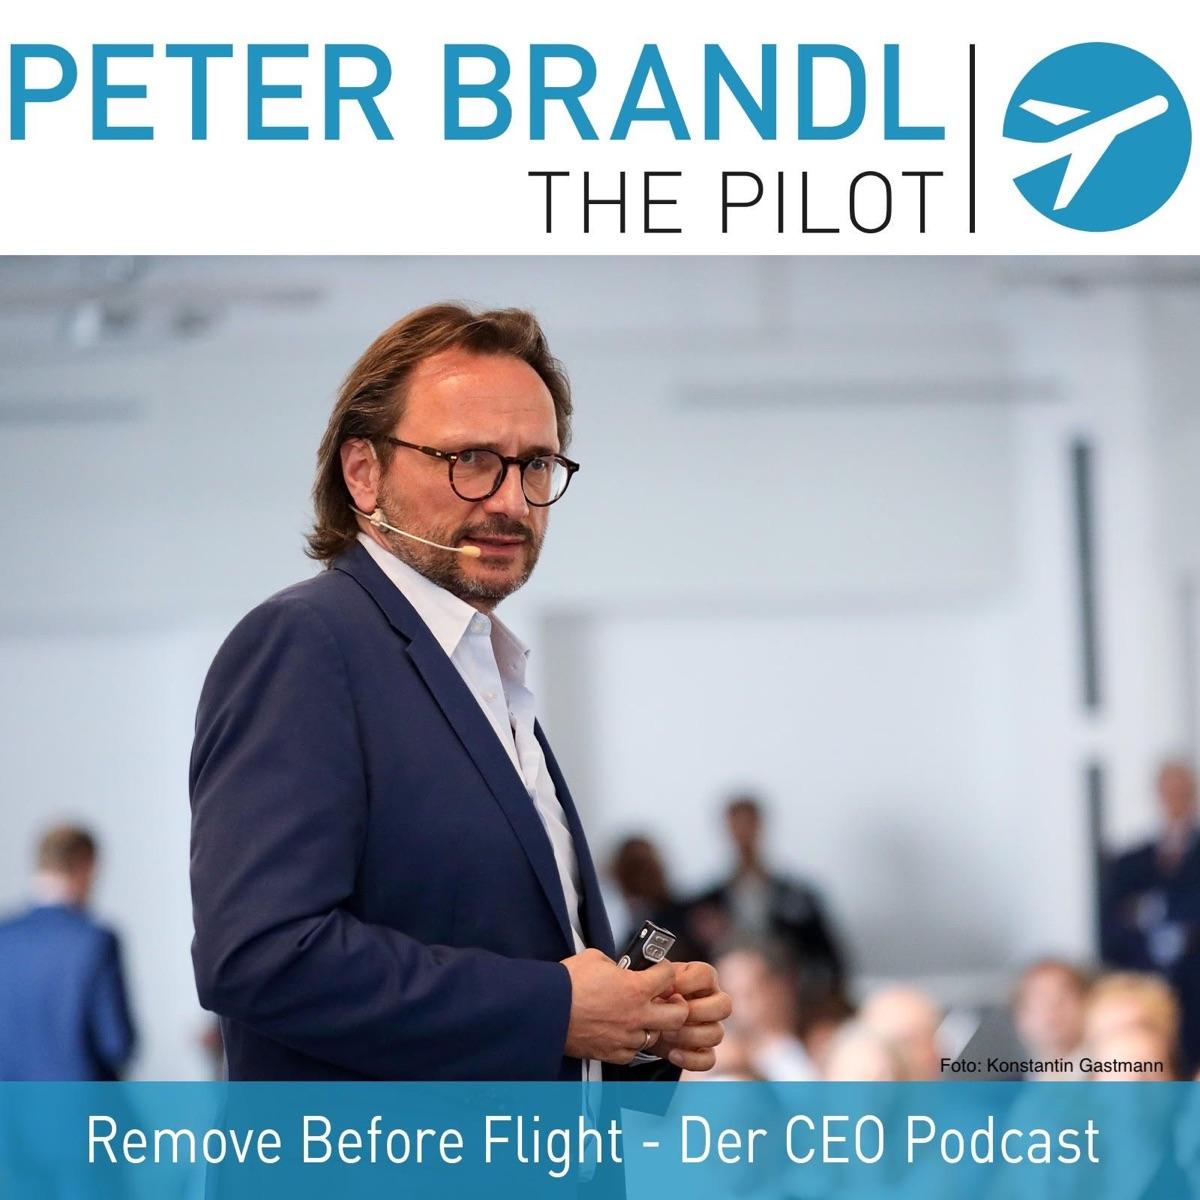 Remove before flight - Der CEO Podcast